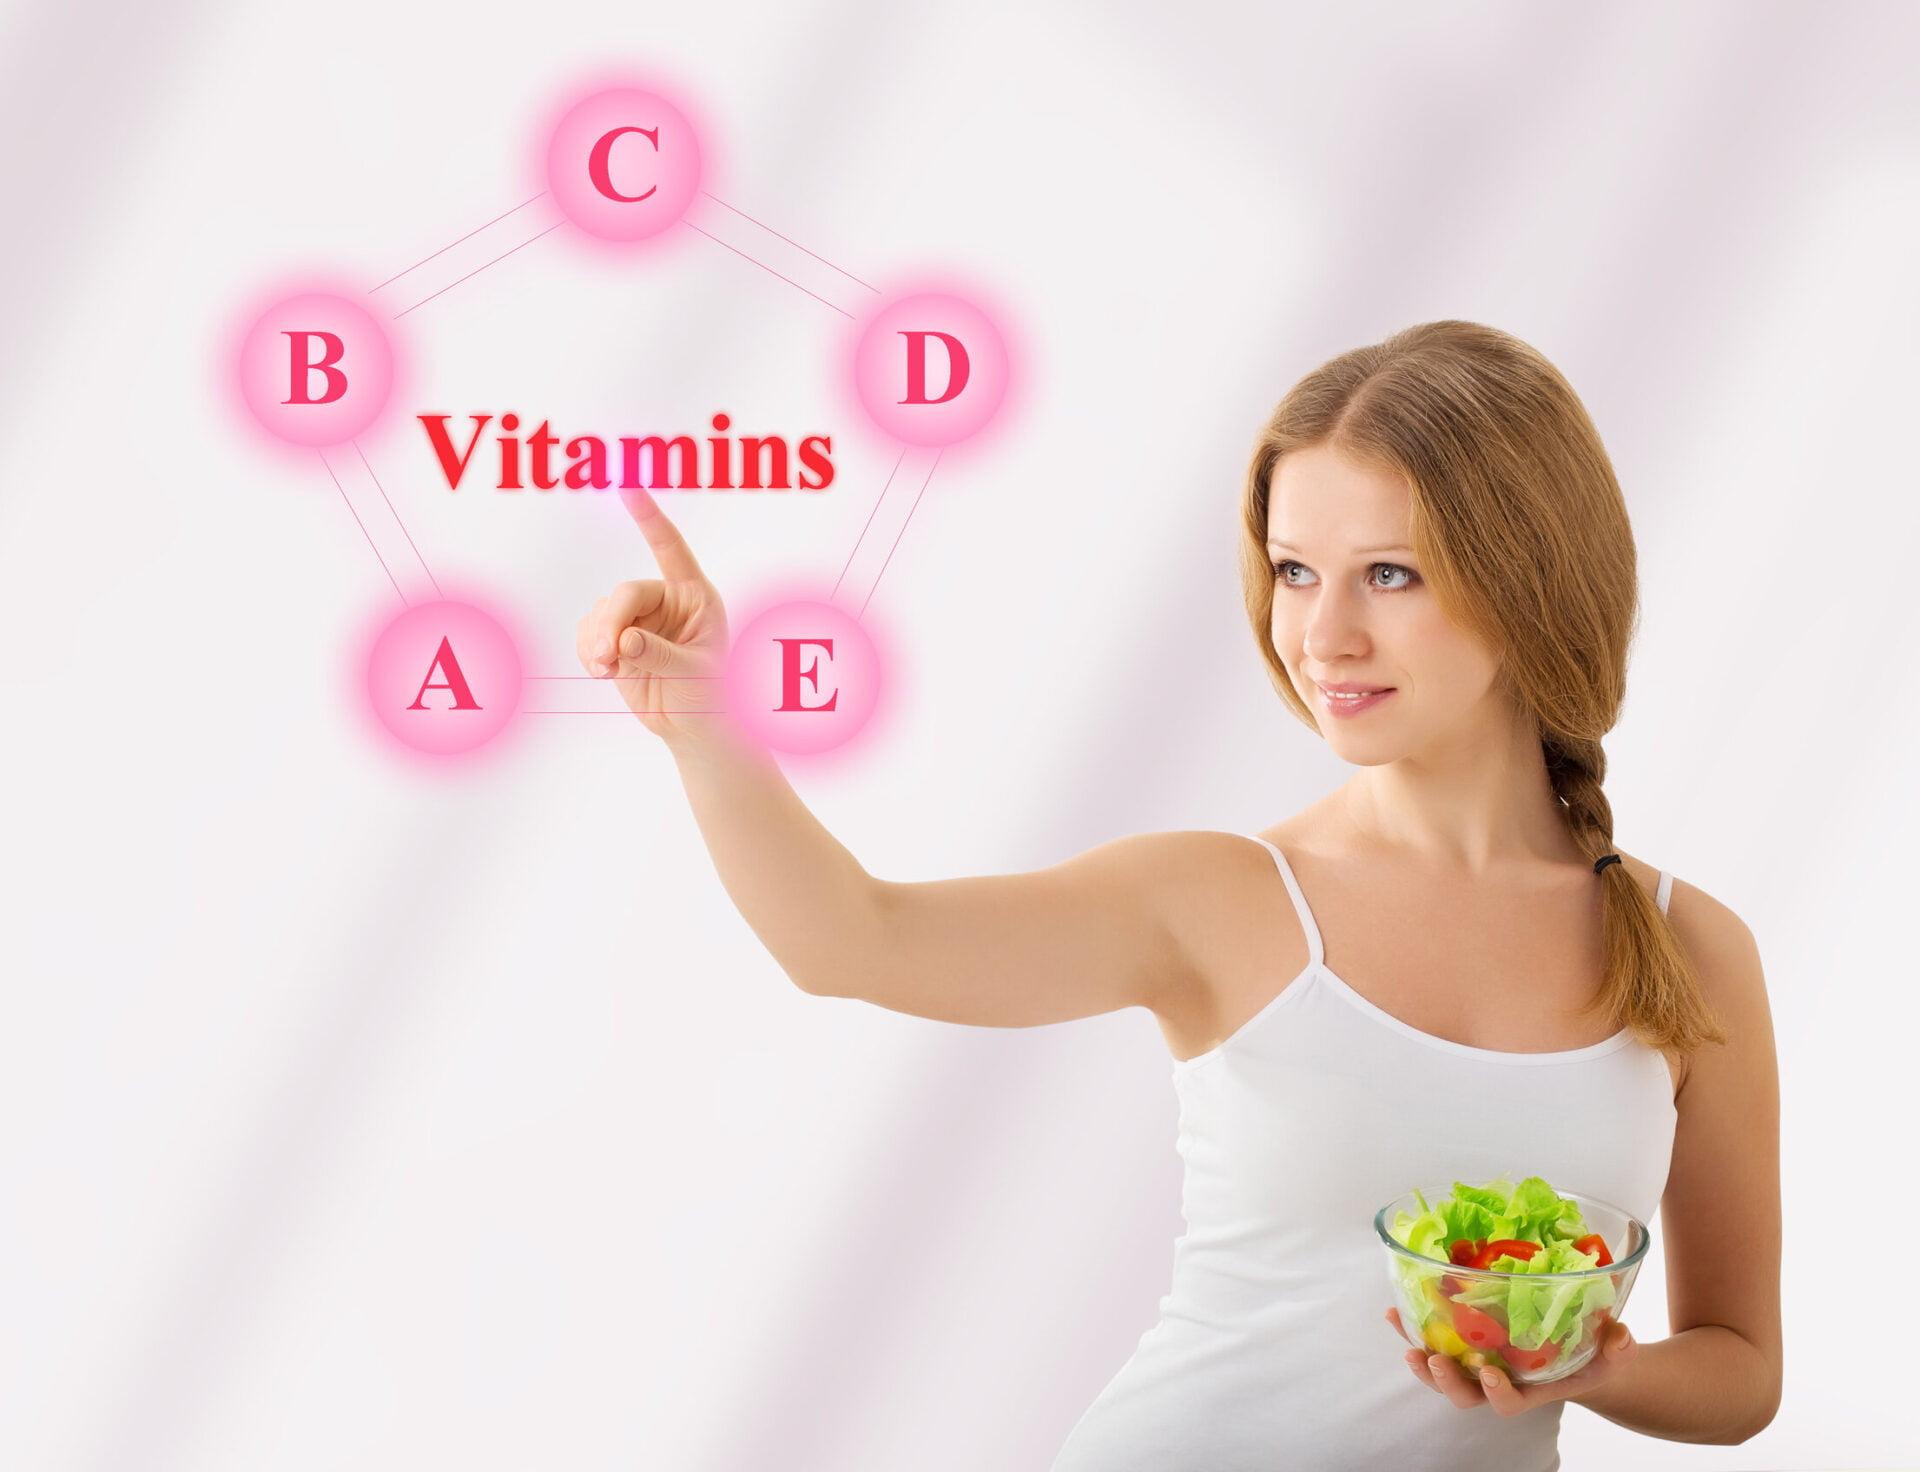 Awitaminoza – zadbaj o zbilansowaną dietę